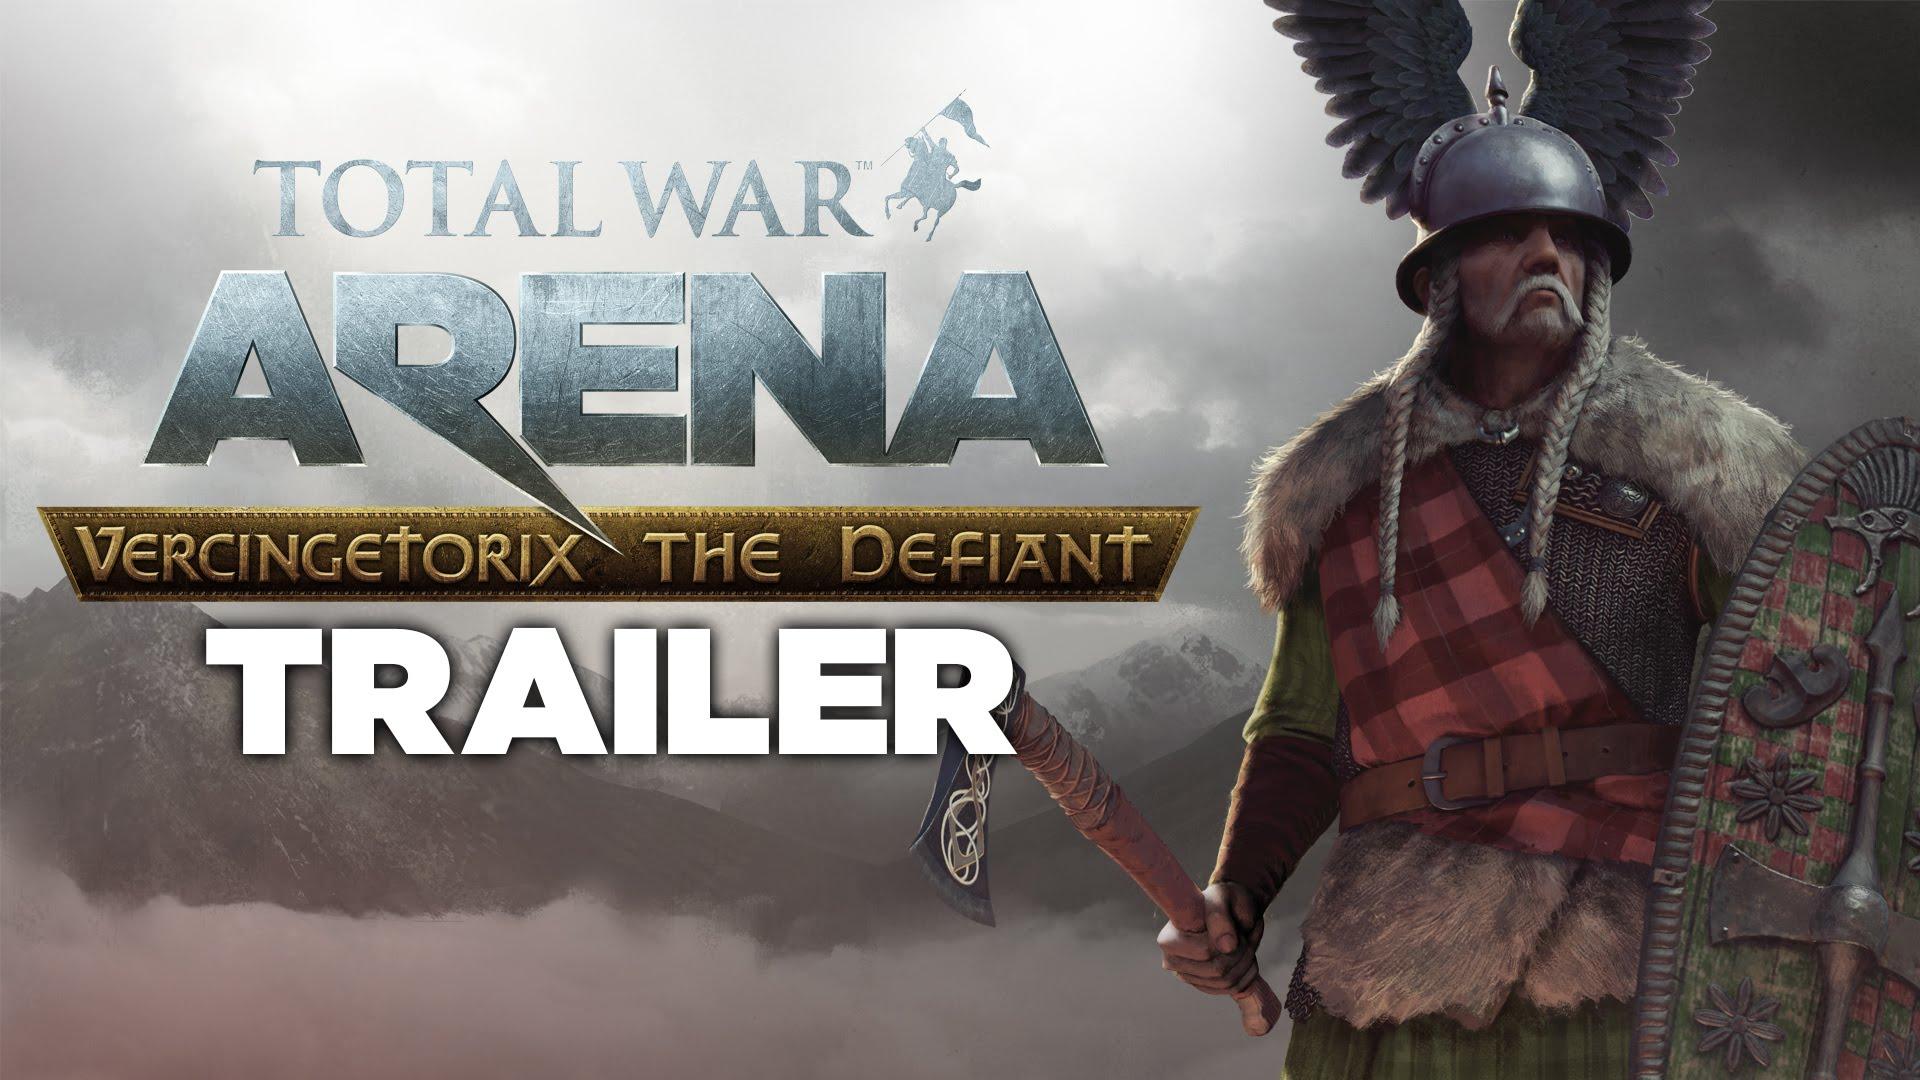 Total War: ARENA - Vercingetorix The Defiant trailer